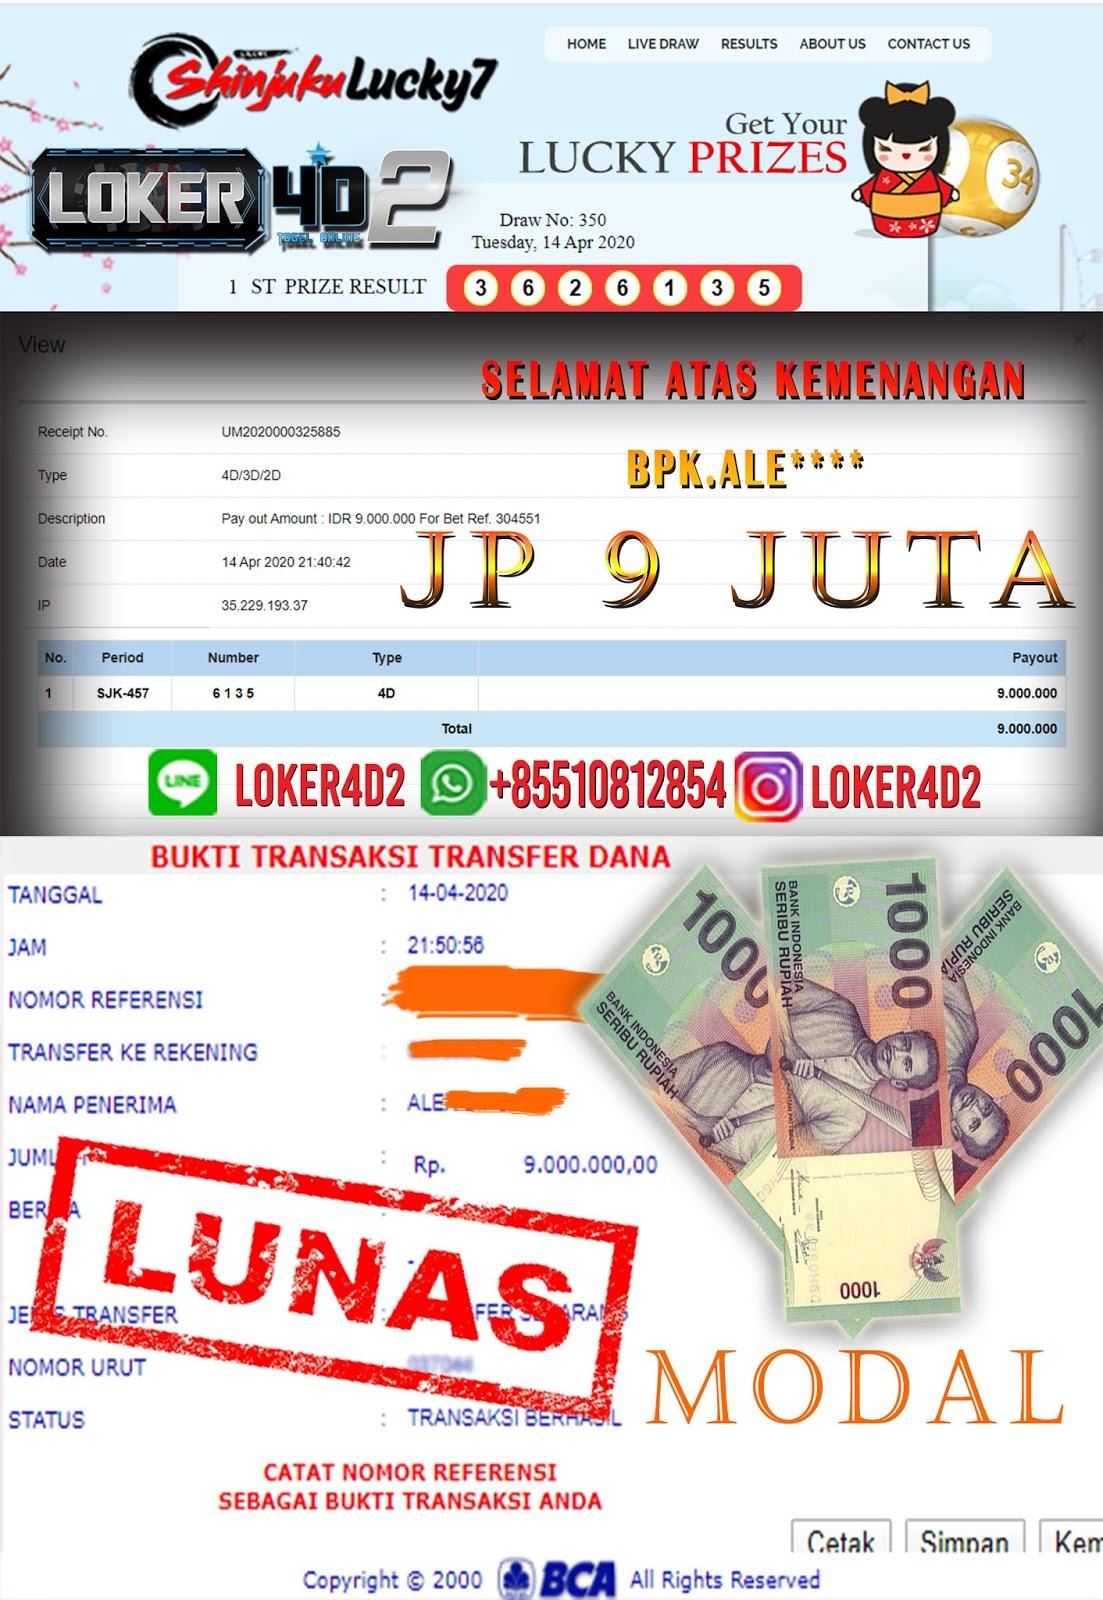 PASARAN SHINJUKU MEMANG MANTAP MODAL 3000 JADI 9 JUTA